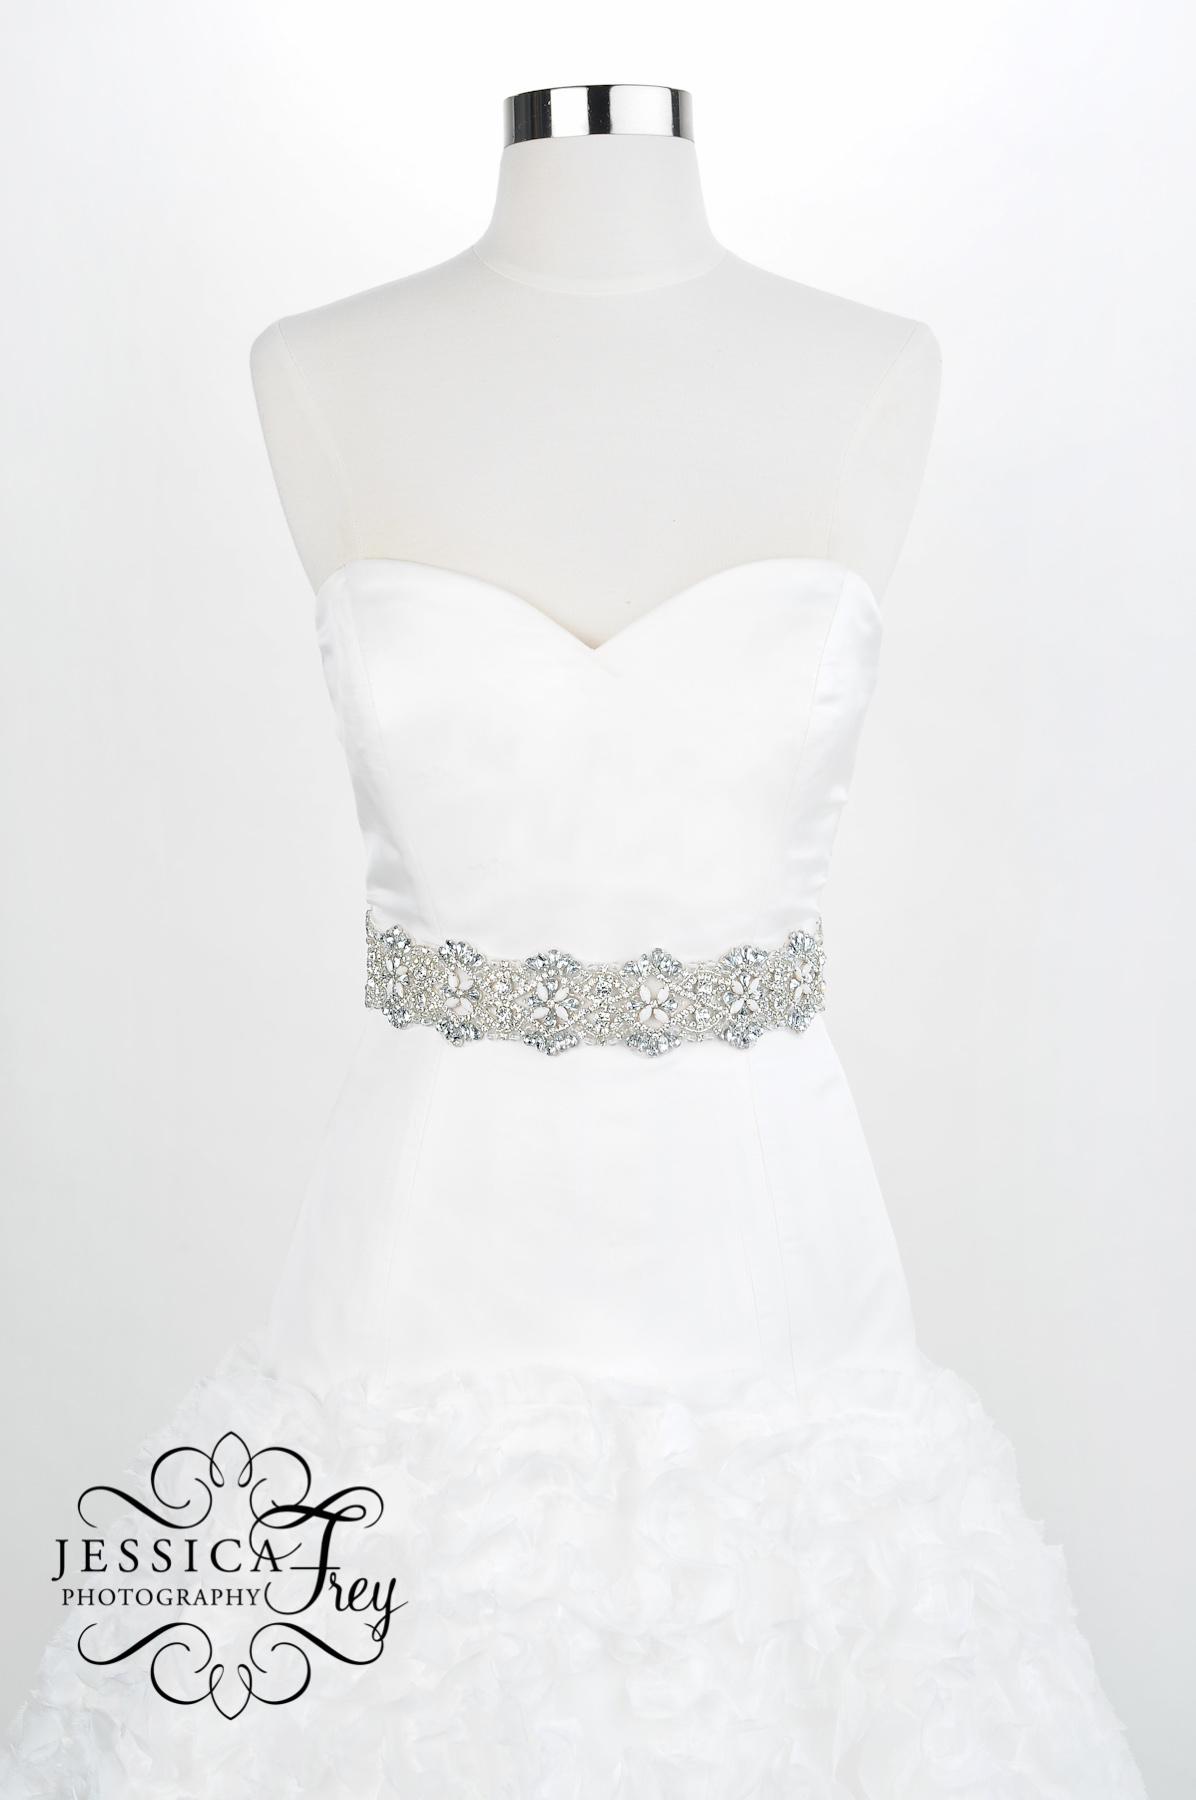 amalee bridal accessories wedding dress belts wedding belts for dresses Jessica Frey Photography wedding dress belts